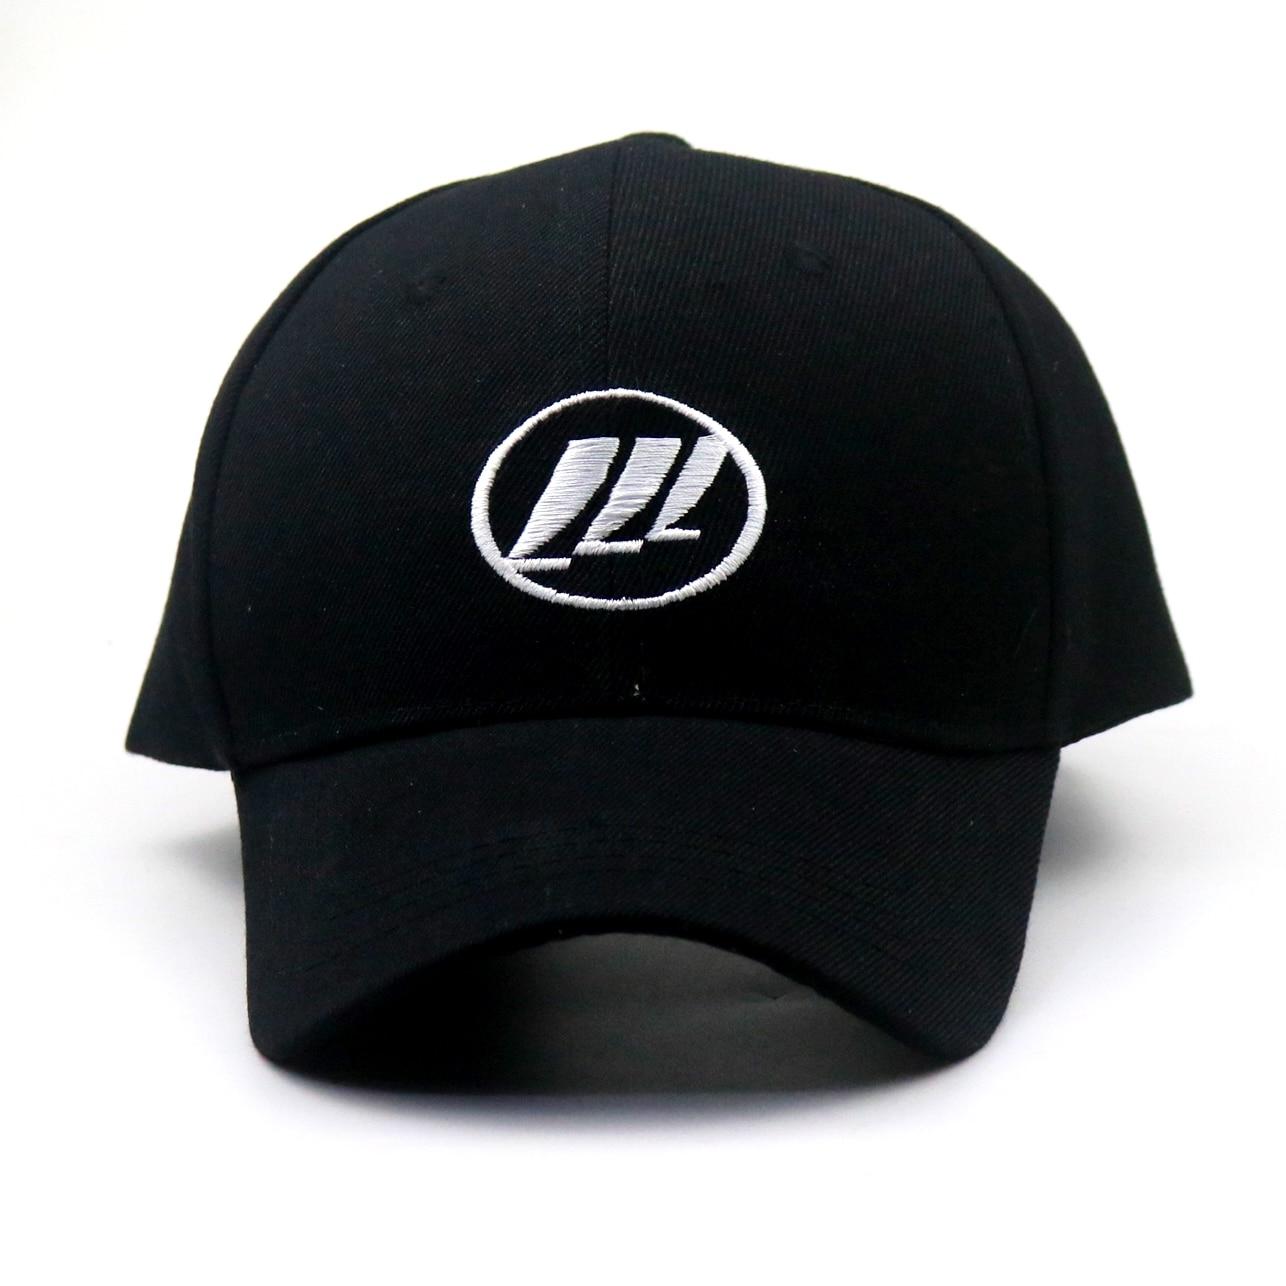 Wholesale Car Logo Hat Cotton High-grade Fabric Racing Cap Lifan  For Lifan Solano X60 X50 520 620 320 Badge Accessories